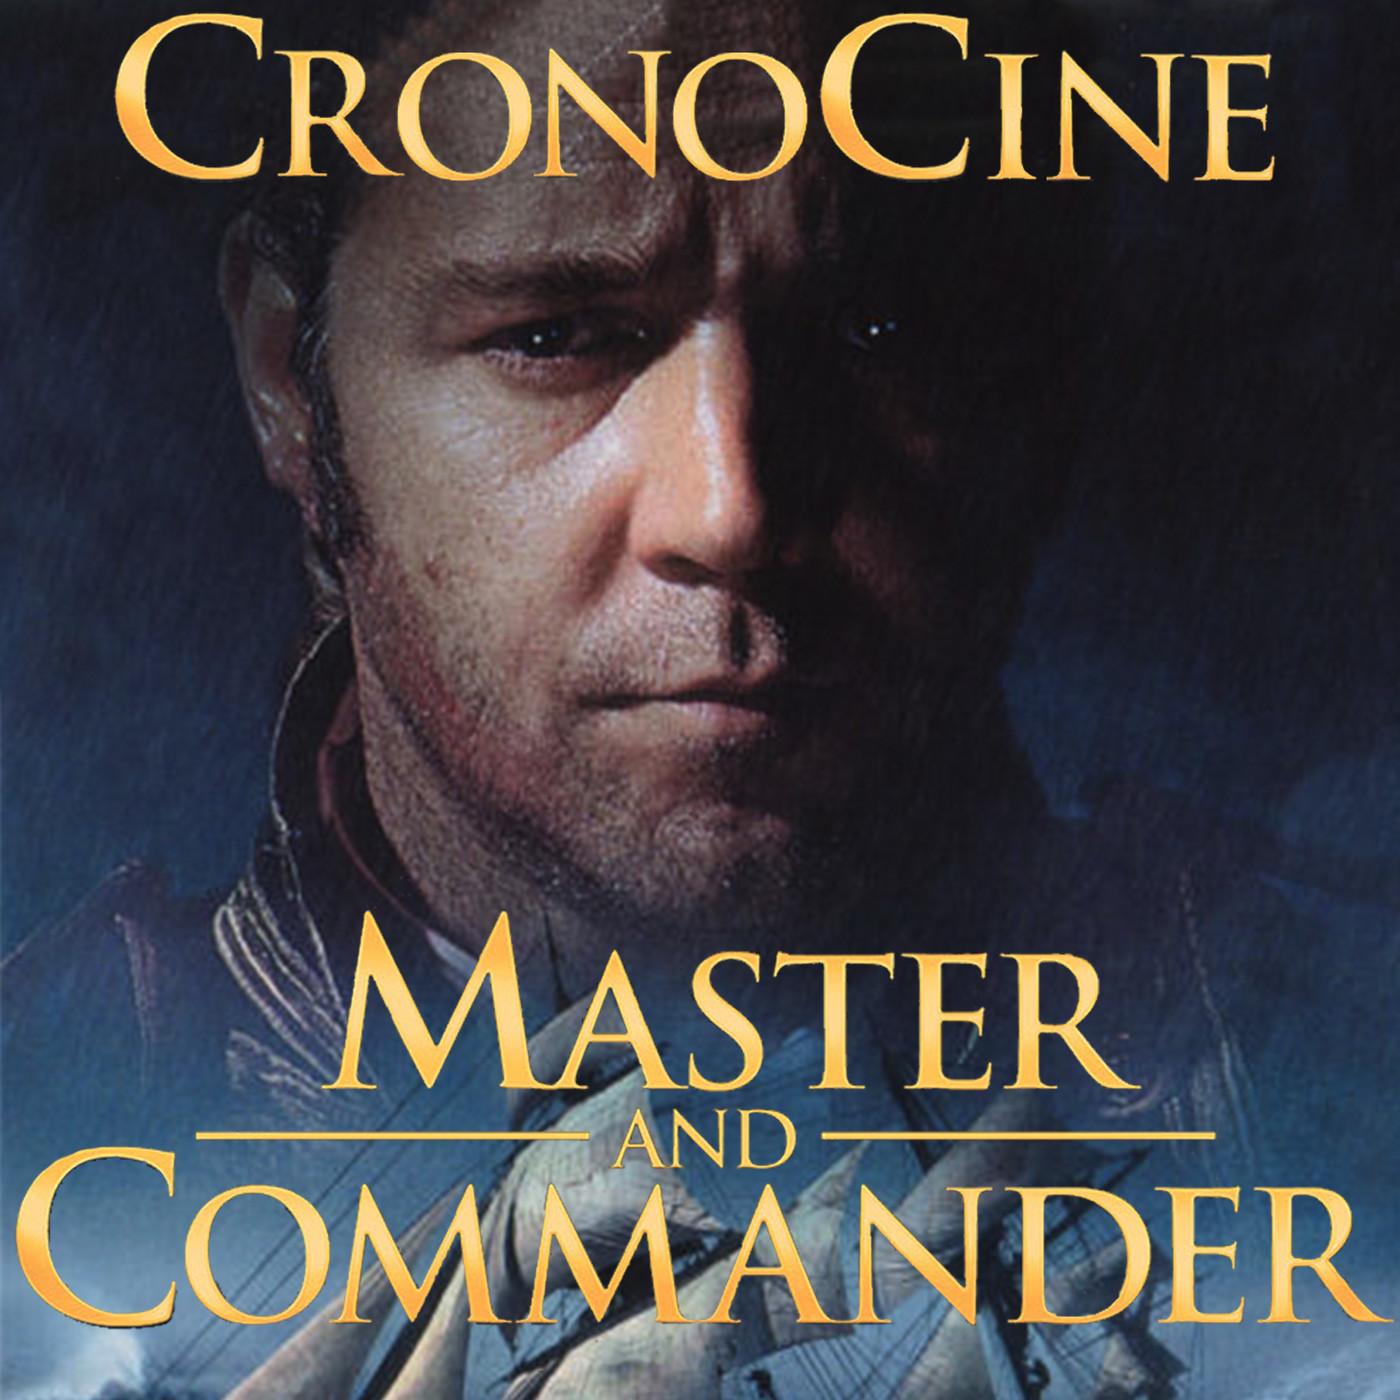 CronoCine 2x16: Master and Commander (Peter Weir, 2003)